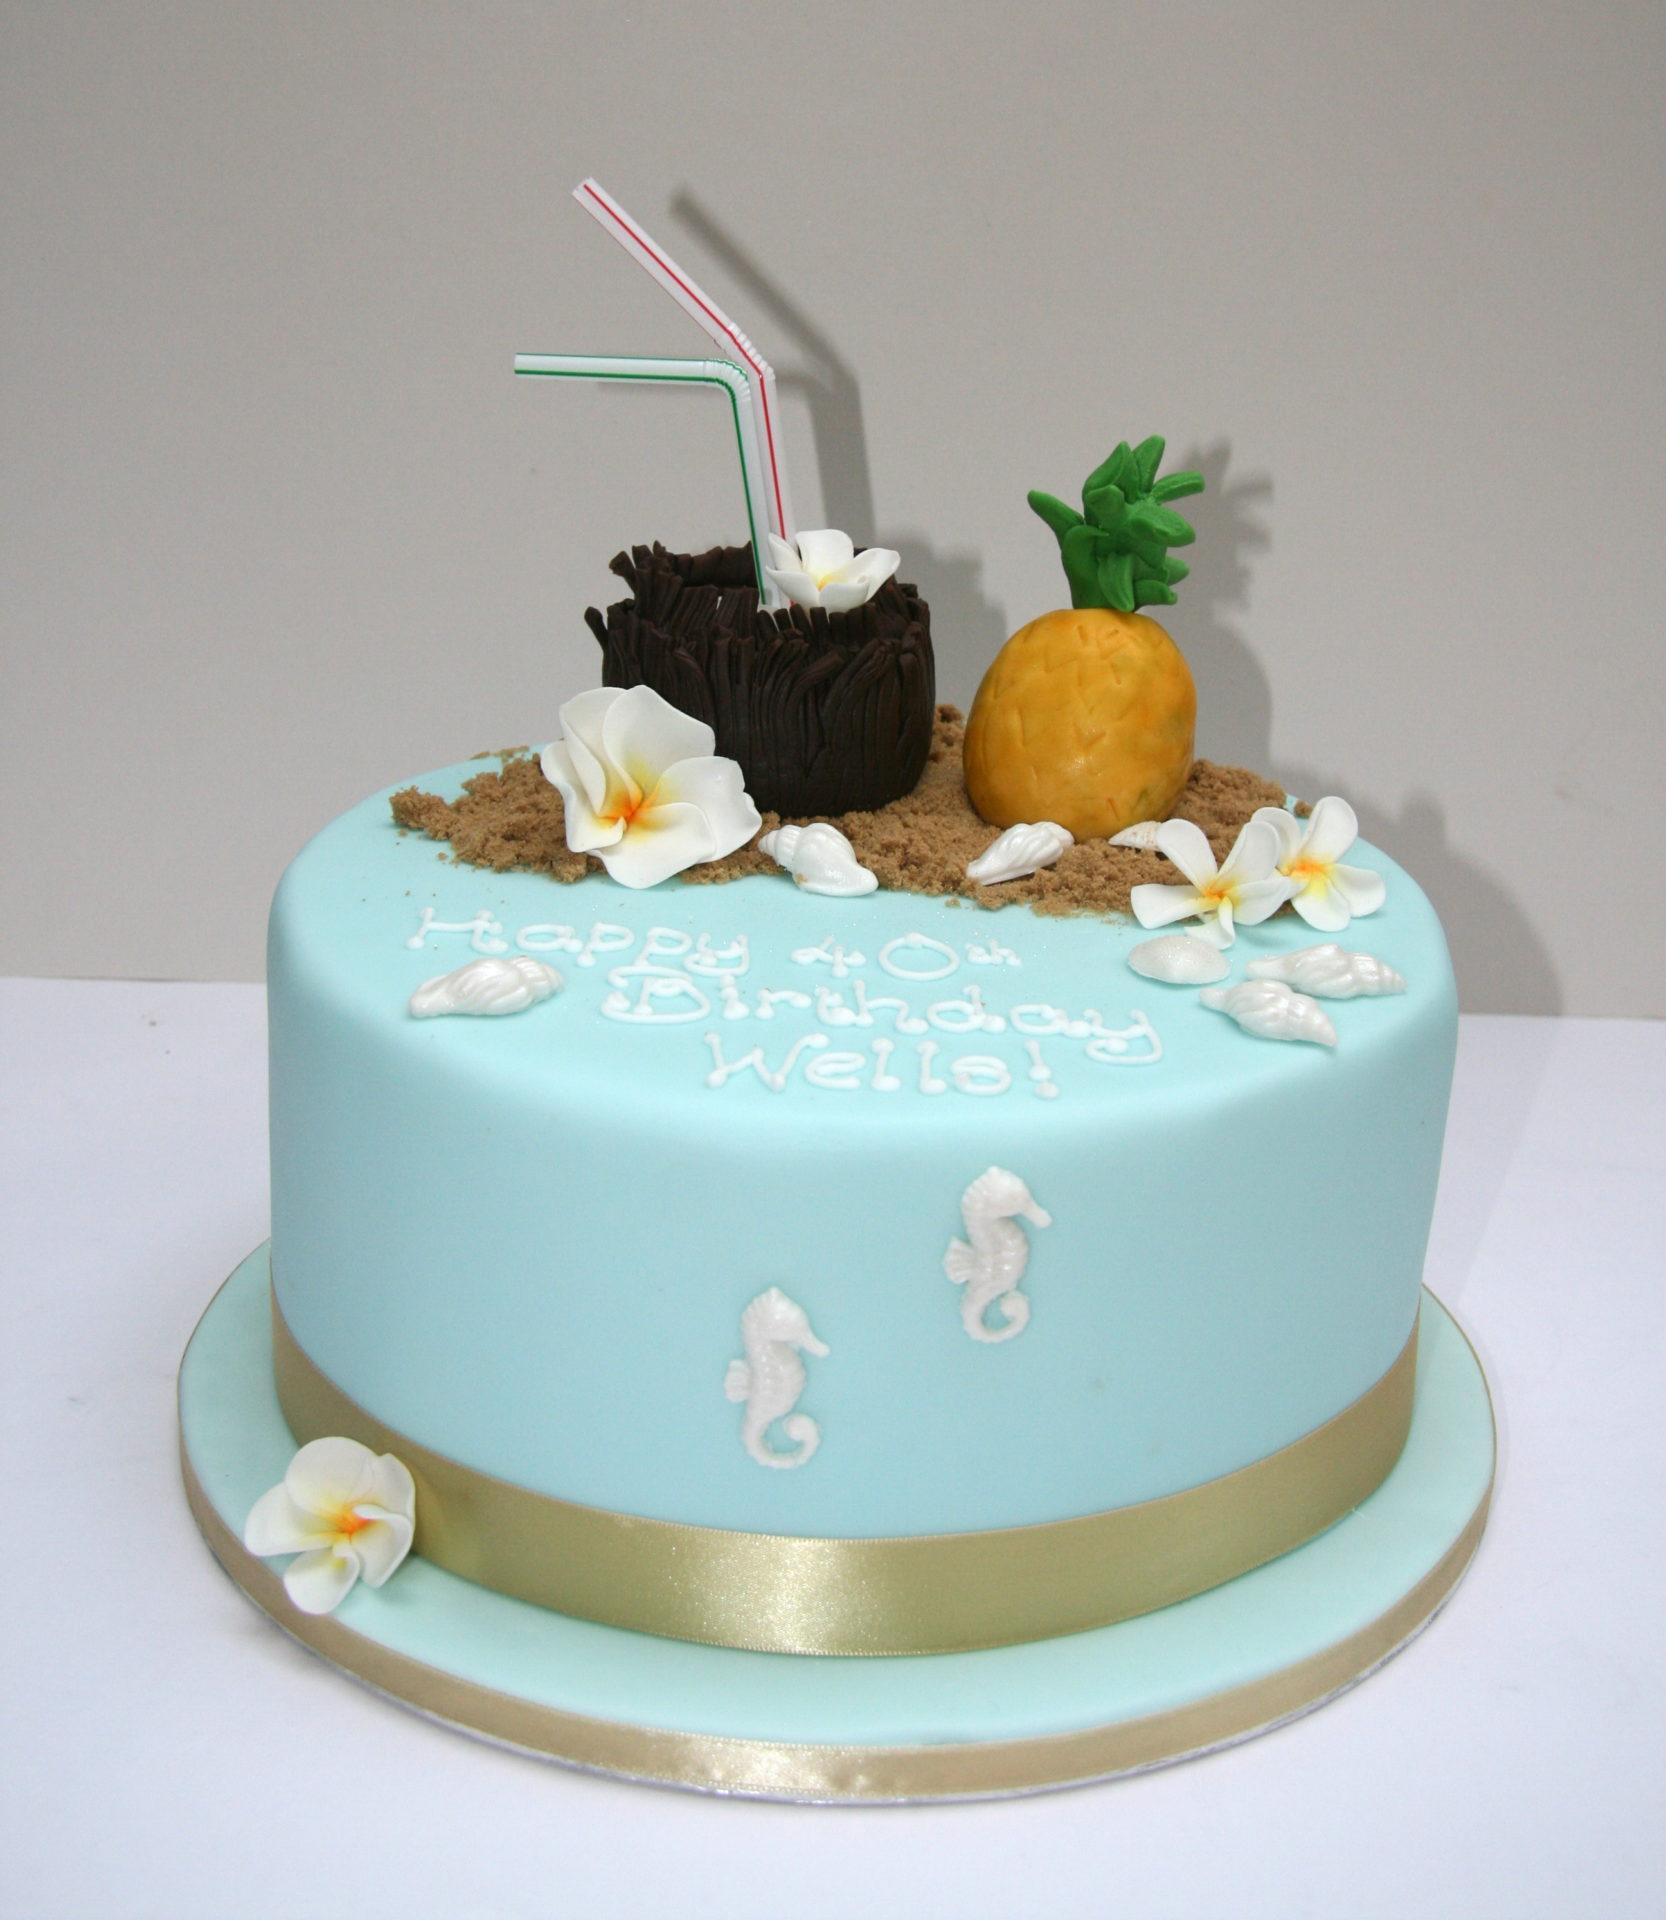 Tropical Cocktails Birthday Cake London – Etoile Bakery